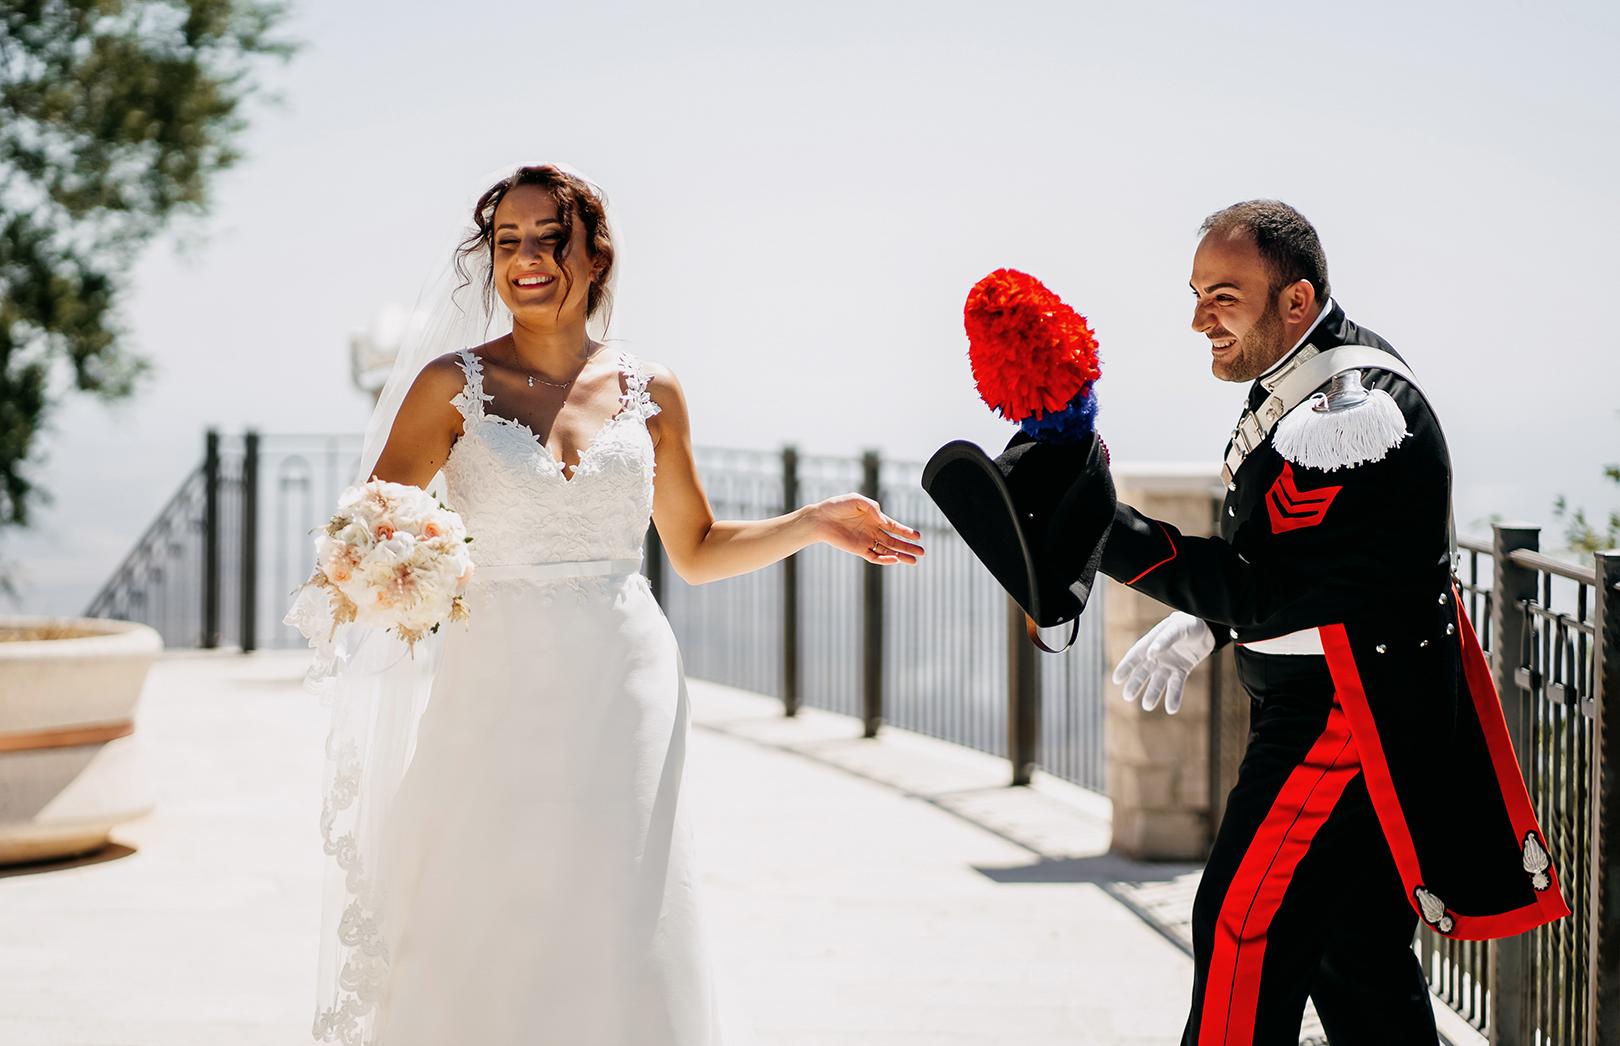 19 gianni-lepore-matrimonio-fotografo-rignano